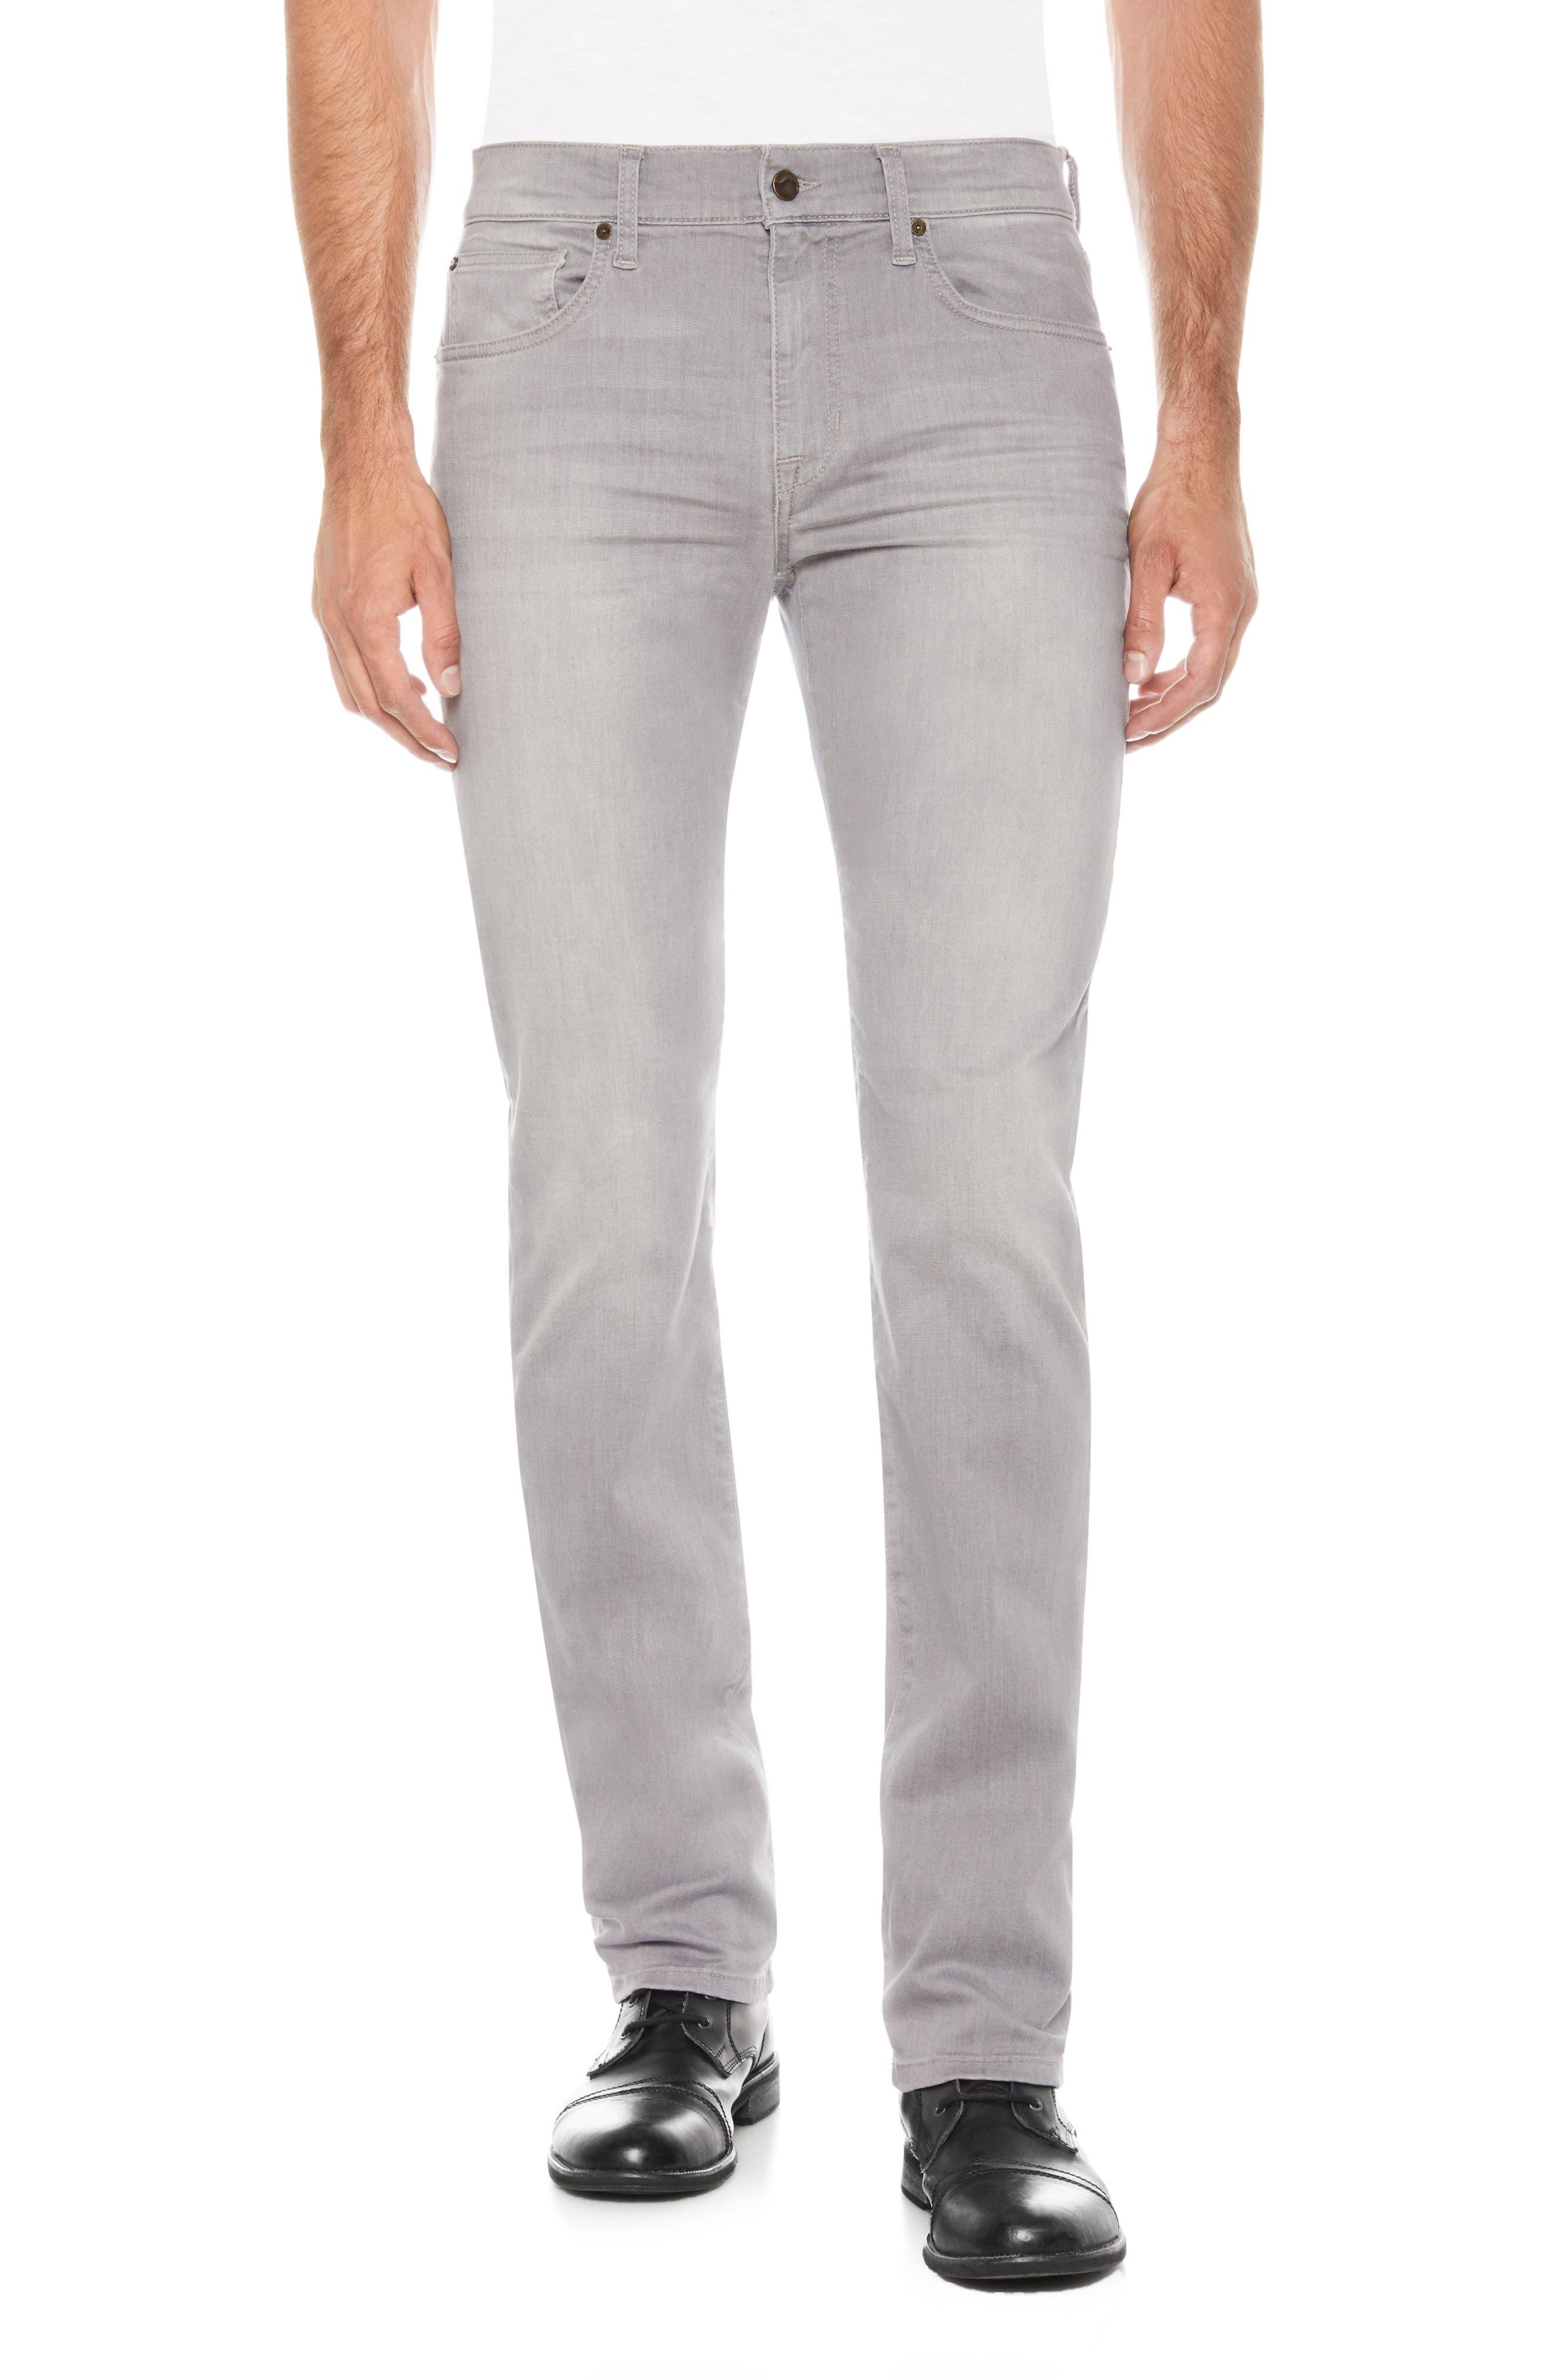 Brixton Slim Straight Fit Jeans,                             Main thumbnail 1, color,                             Steve